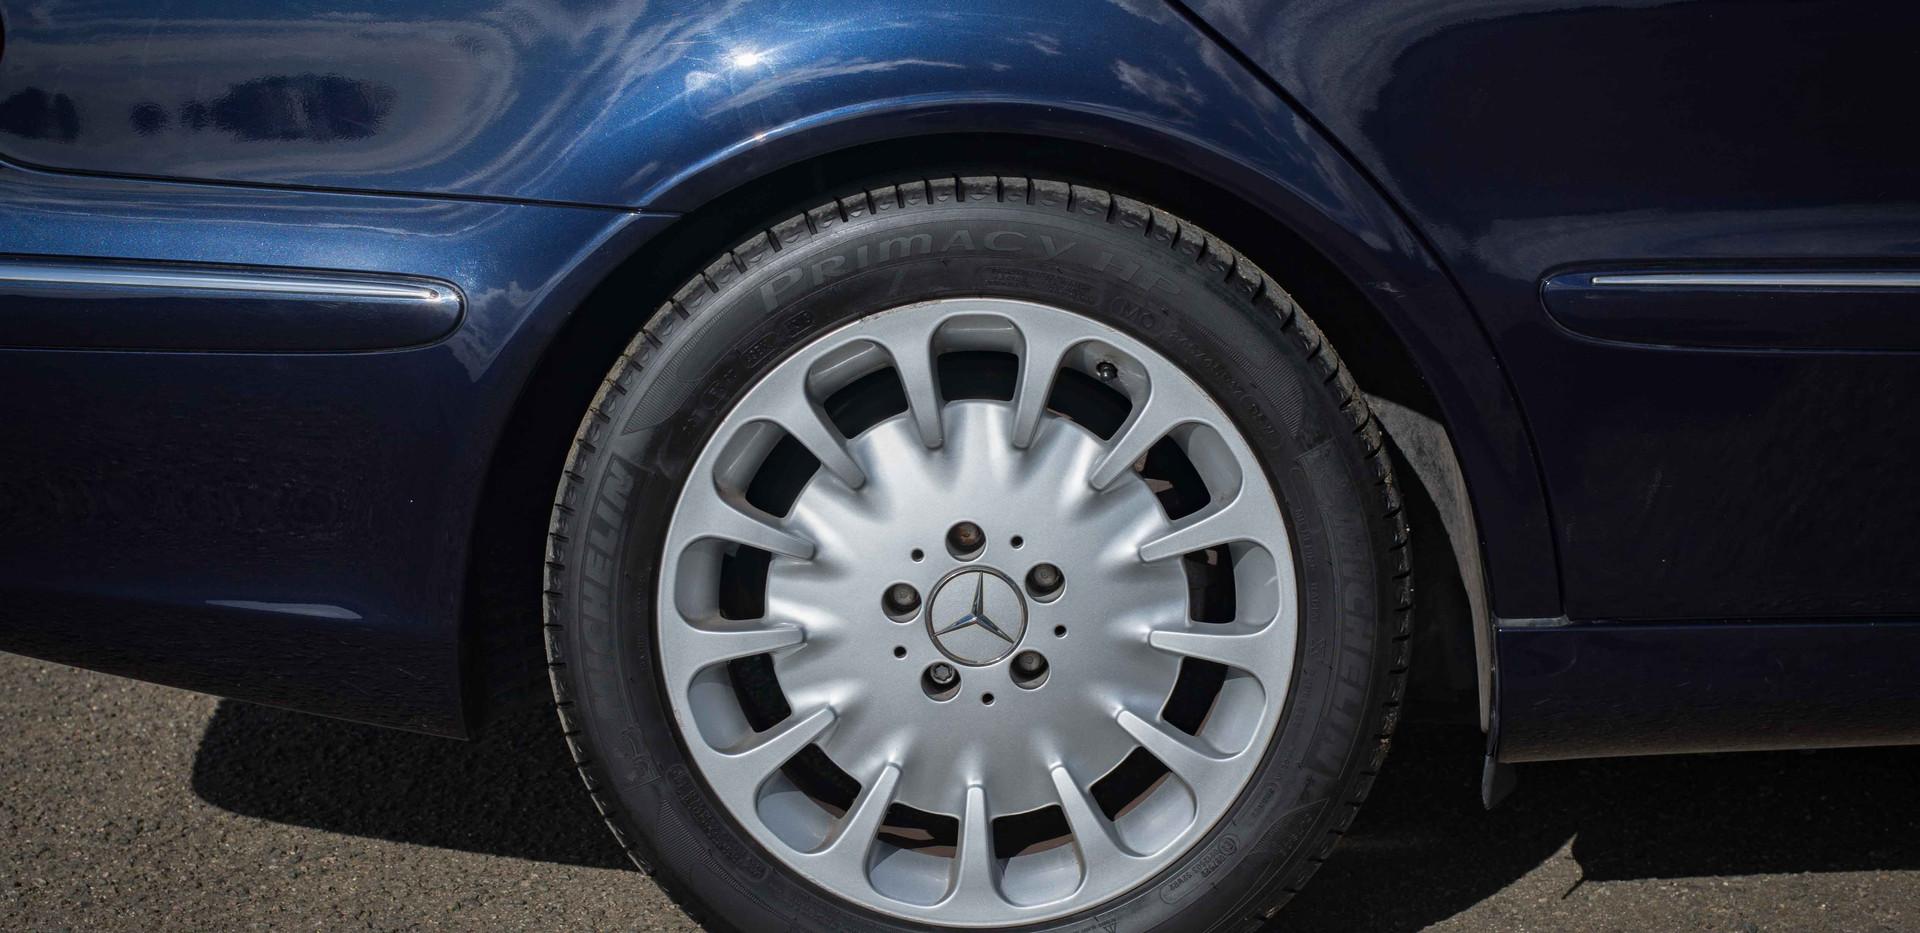 Mercedes E500 For Sale UK London  (23 of